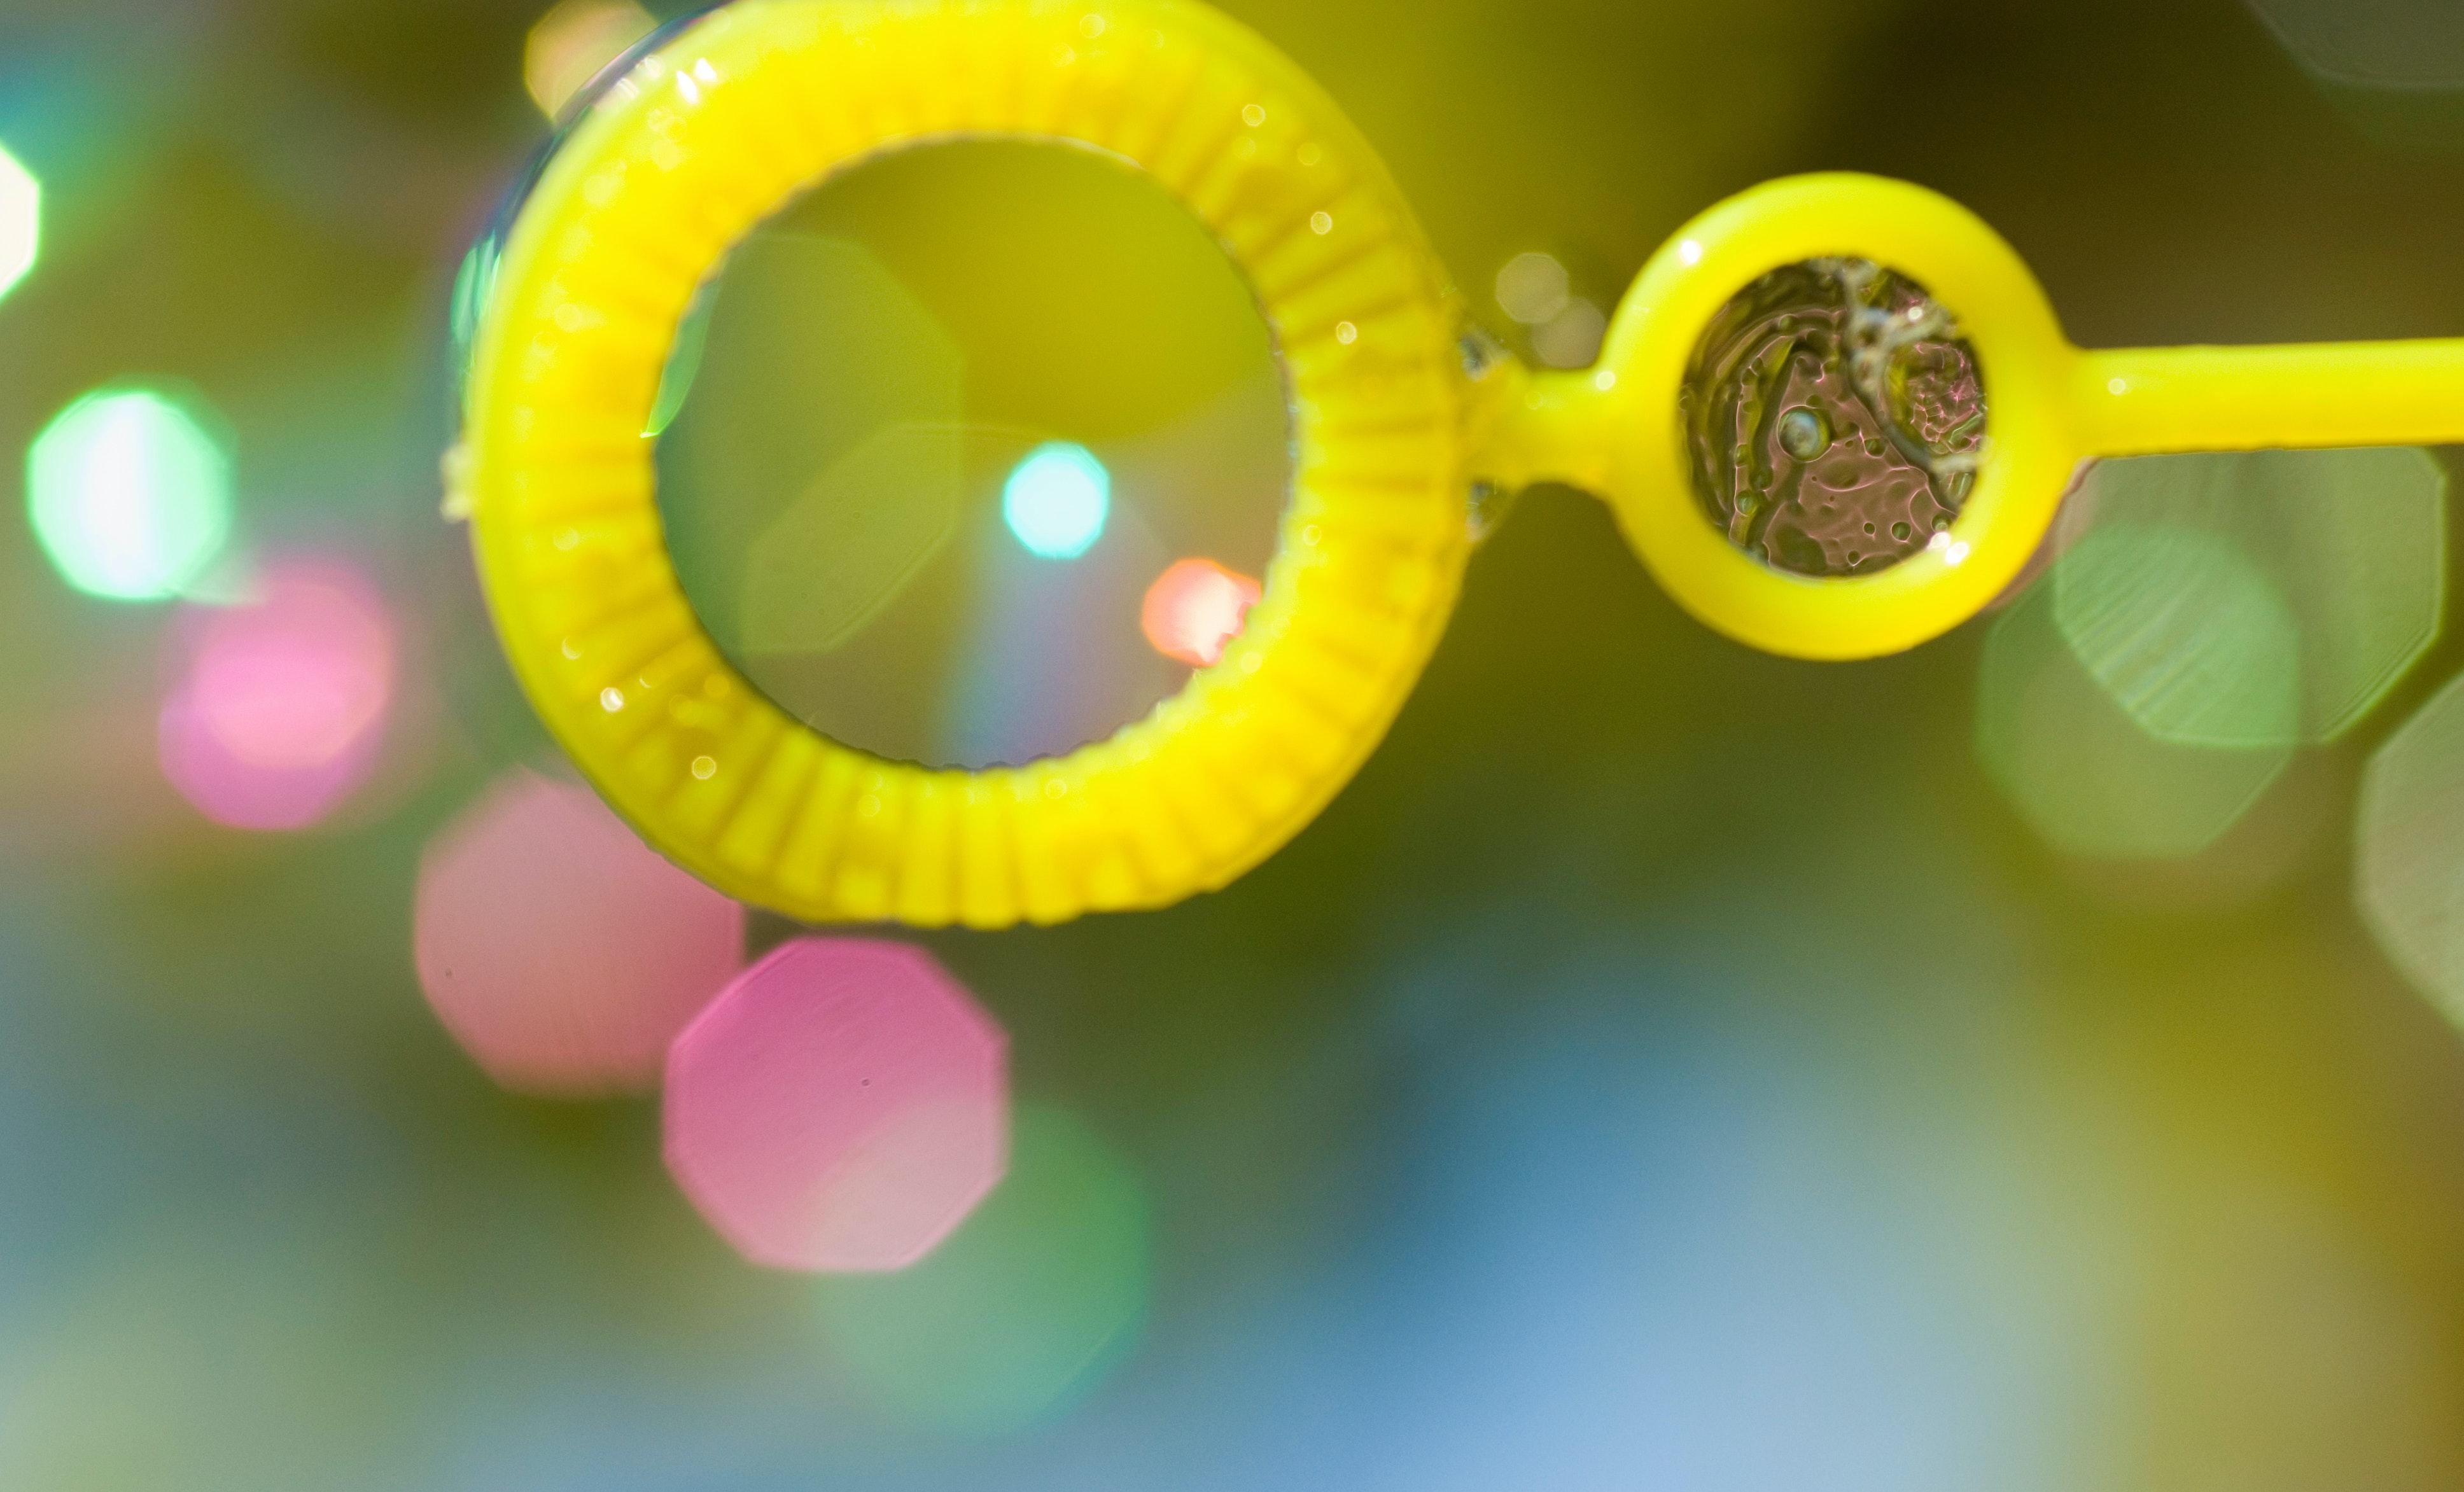 Seifenblasen symbolbild erzieher gehalt.f7fb467a3c31c4a7d005f4a6e6c59c40e